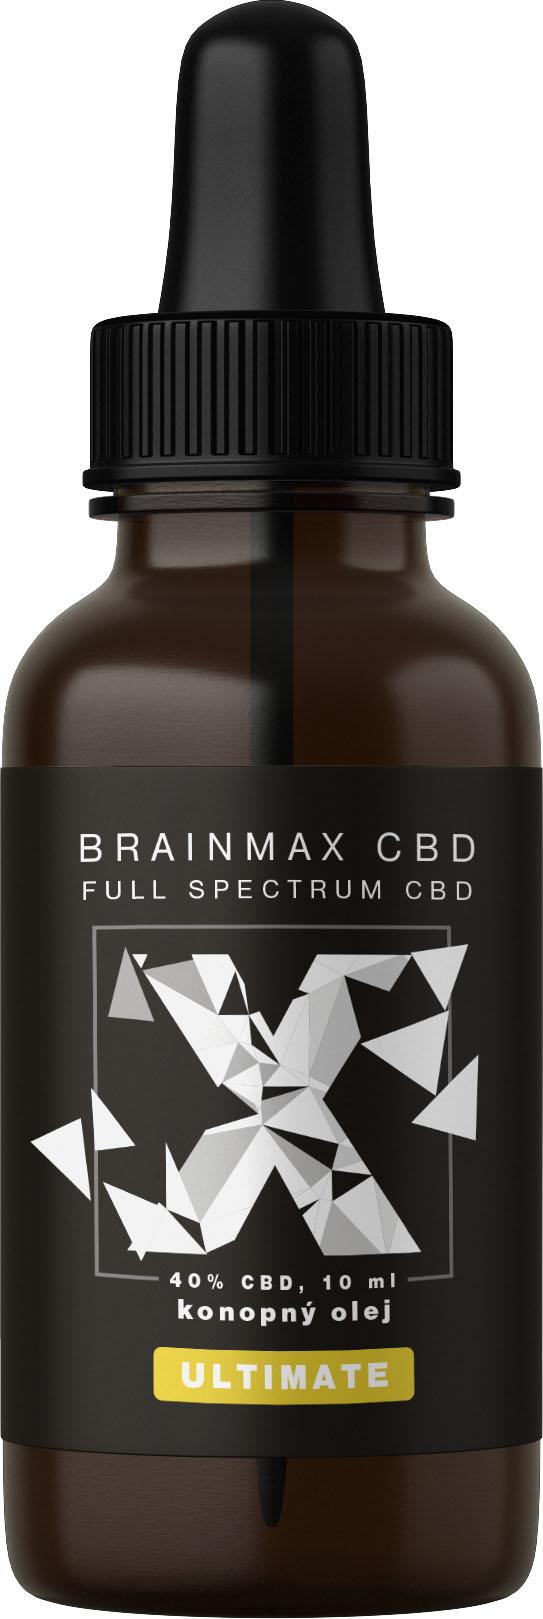 BrainMax CéBéDé ULTIMATE, 40%, 10 ml